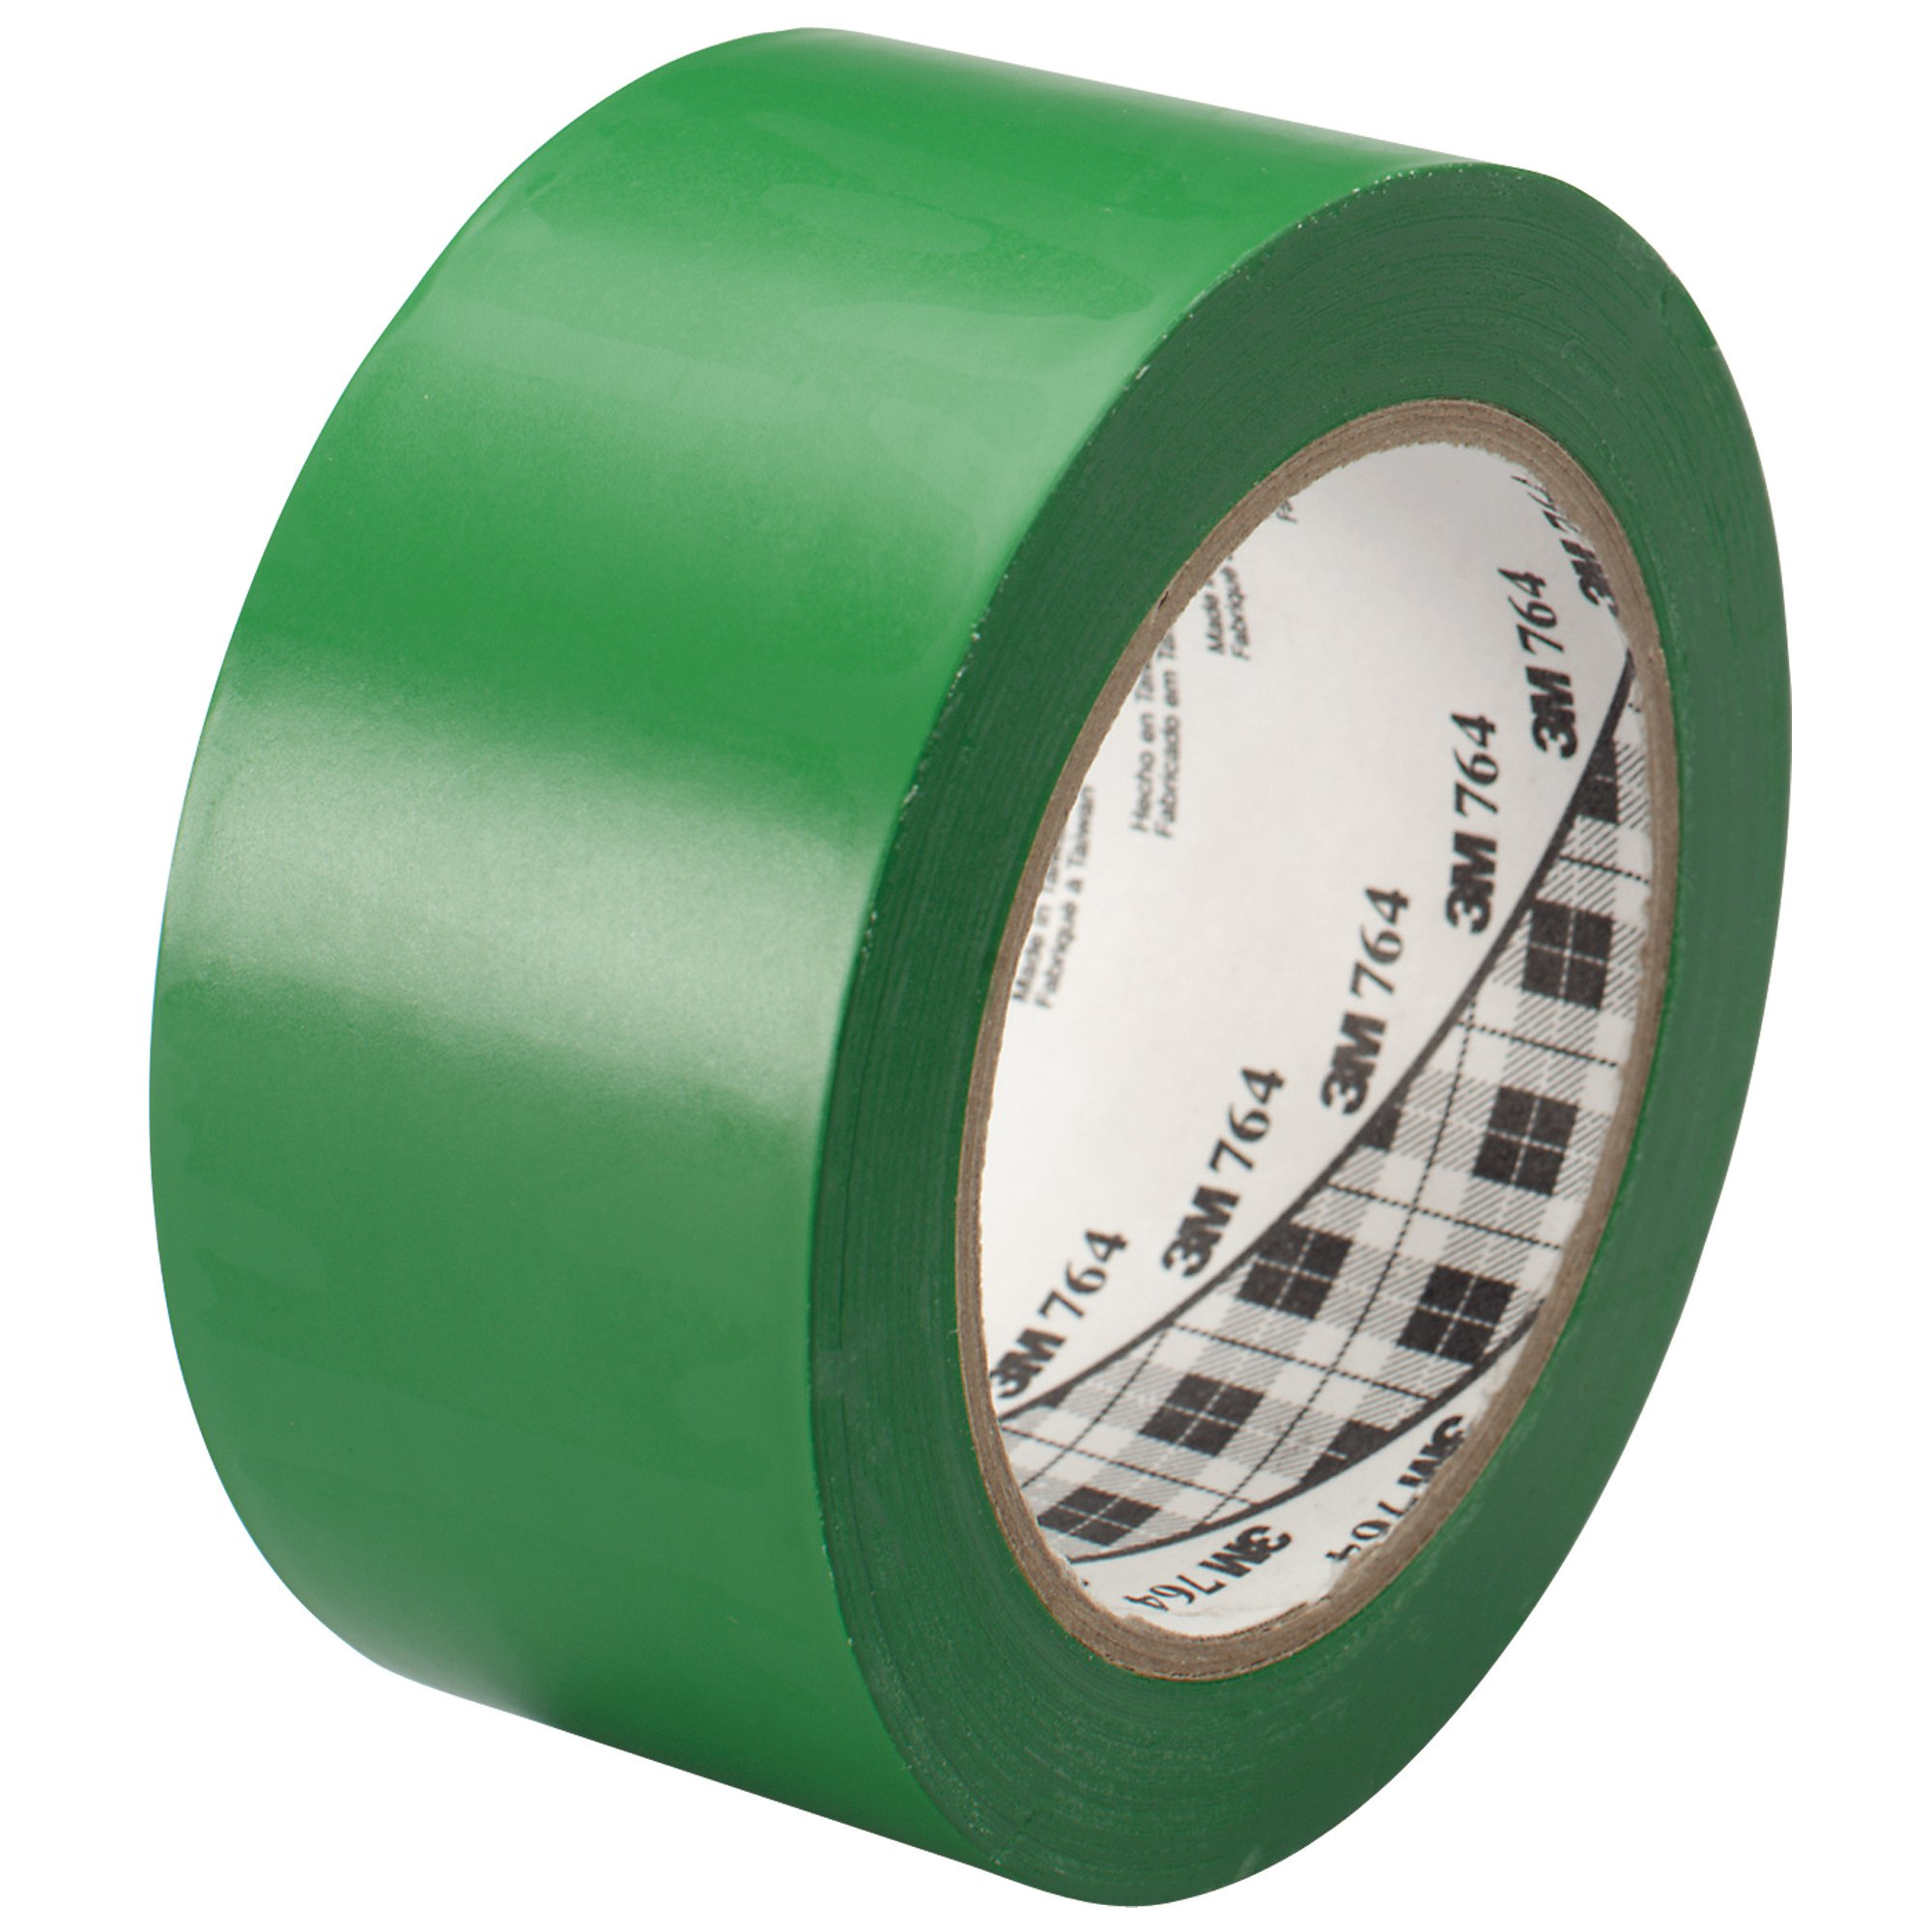 3M T967764G Vinyl Tape, 2'' x 36 yd, Green (Pack of 24)